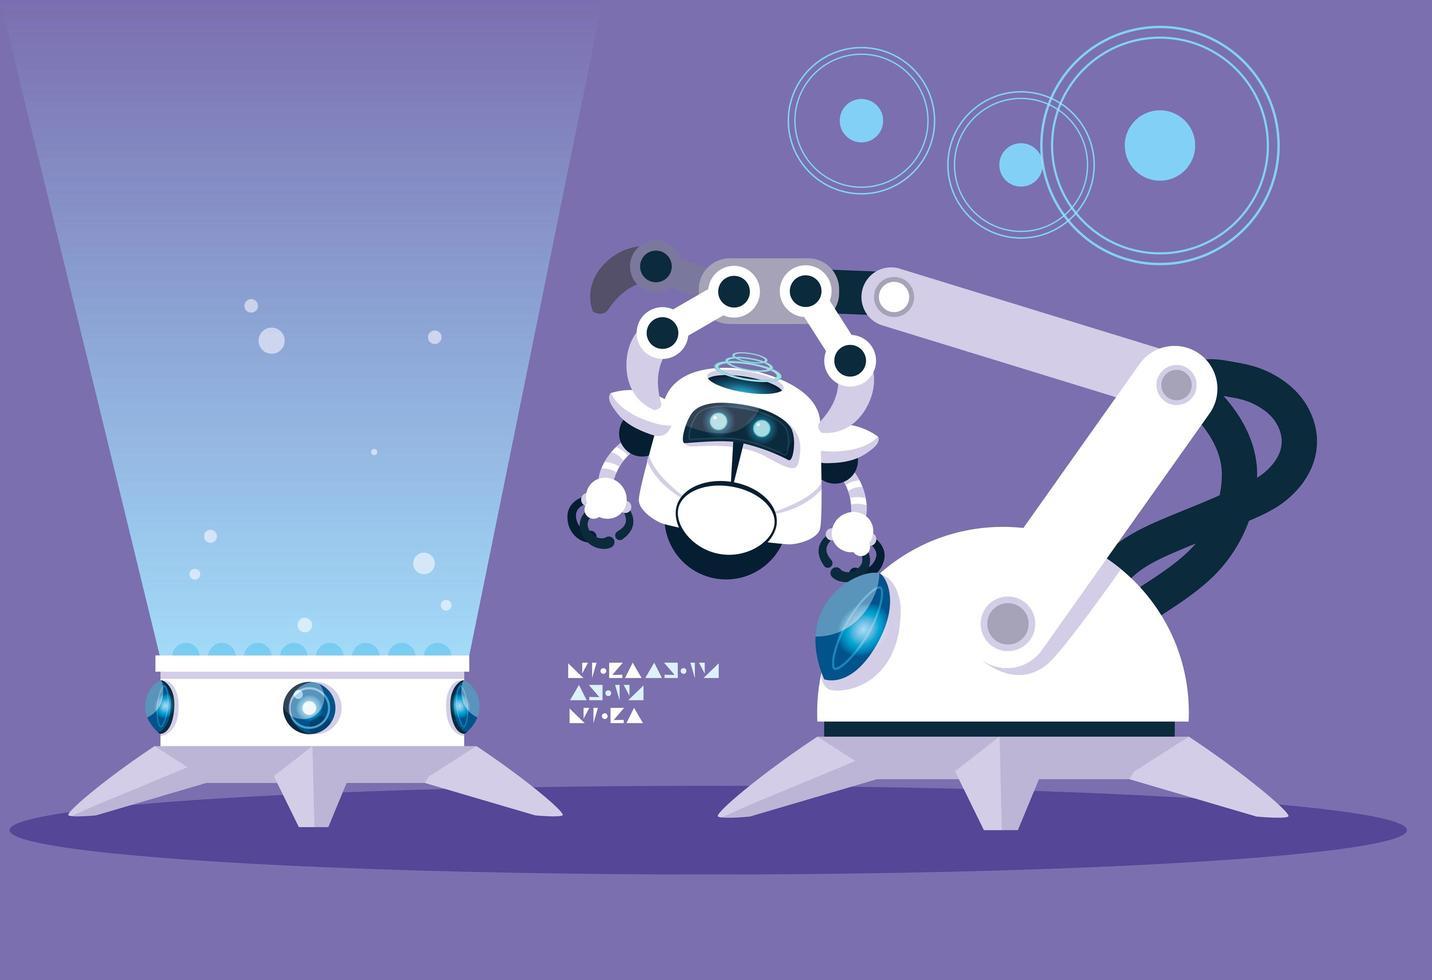 cartoon de tecnologia sobre fundo roxo vetor